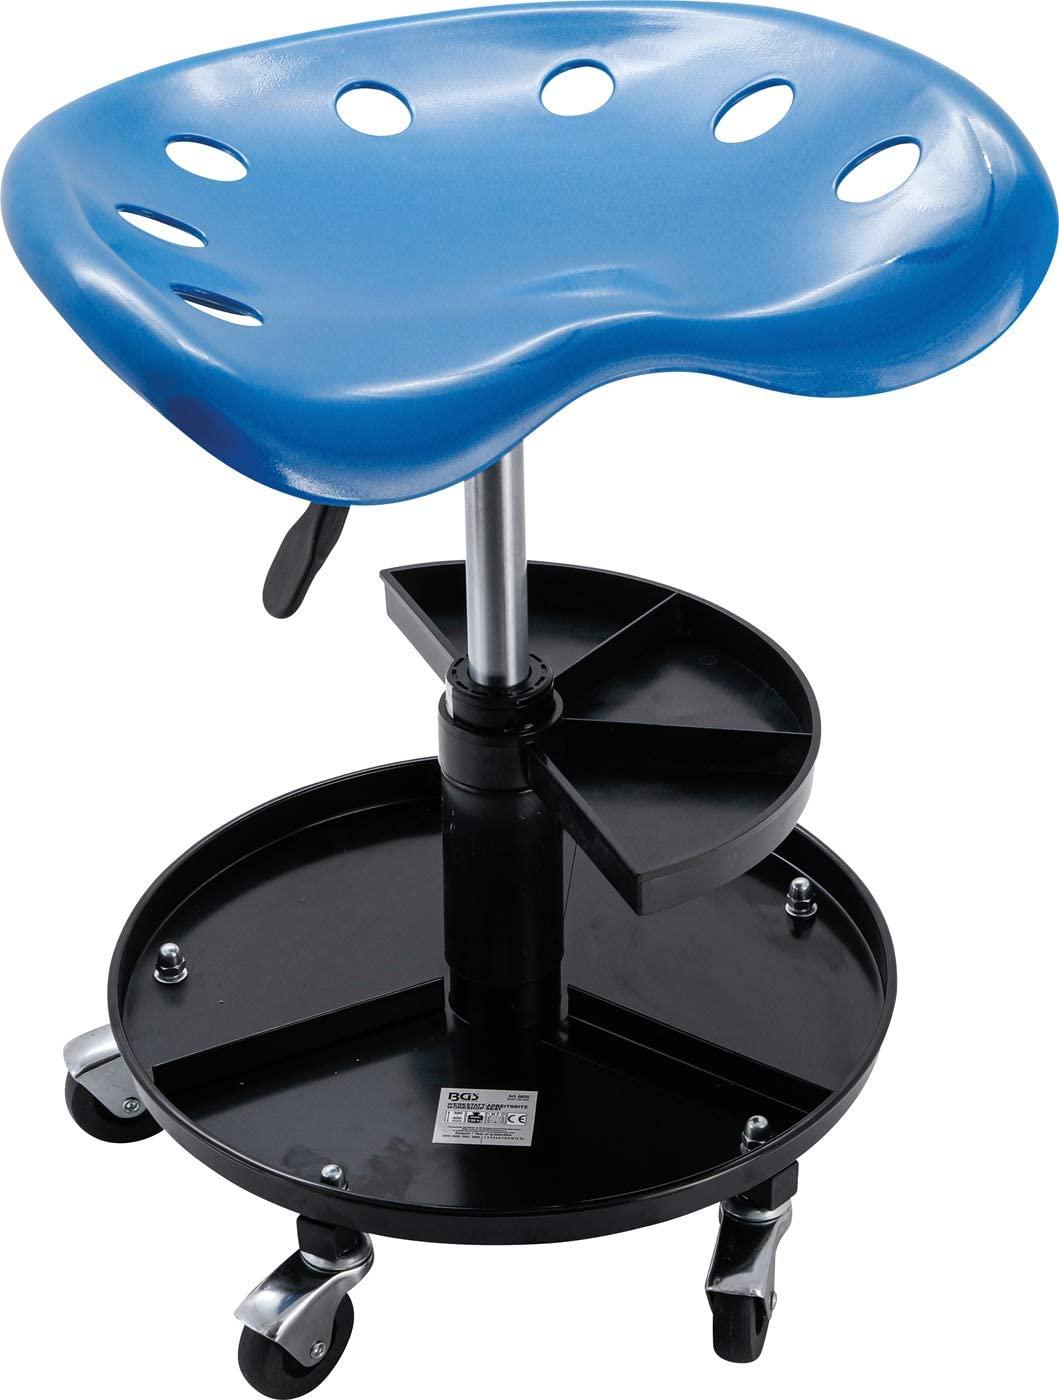 BGS Technic BGS 6820 Workshop Work Seat 2 Shelves ABS 440 x 350 mm